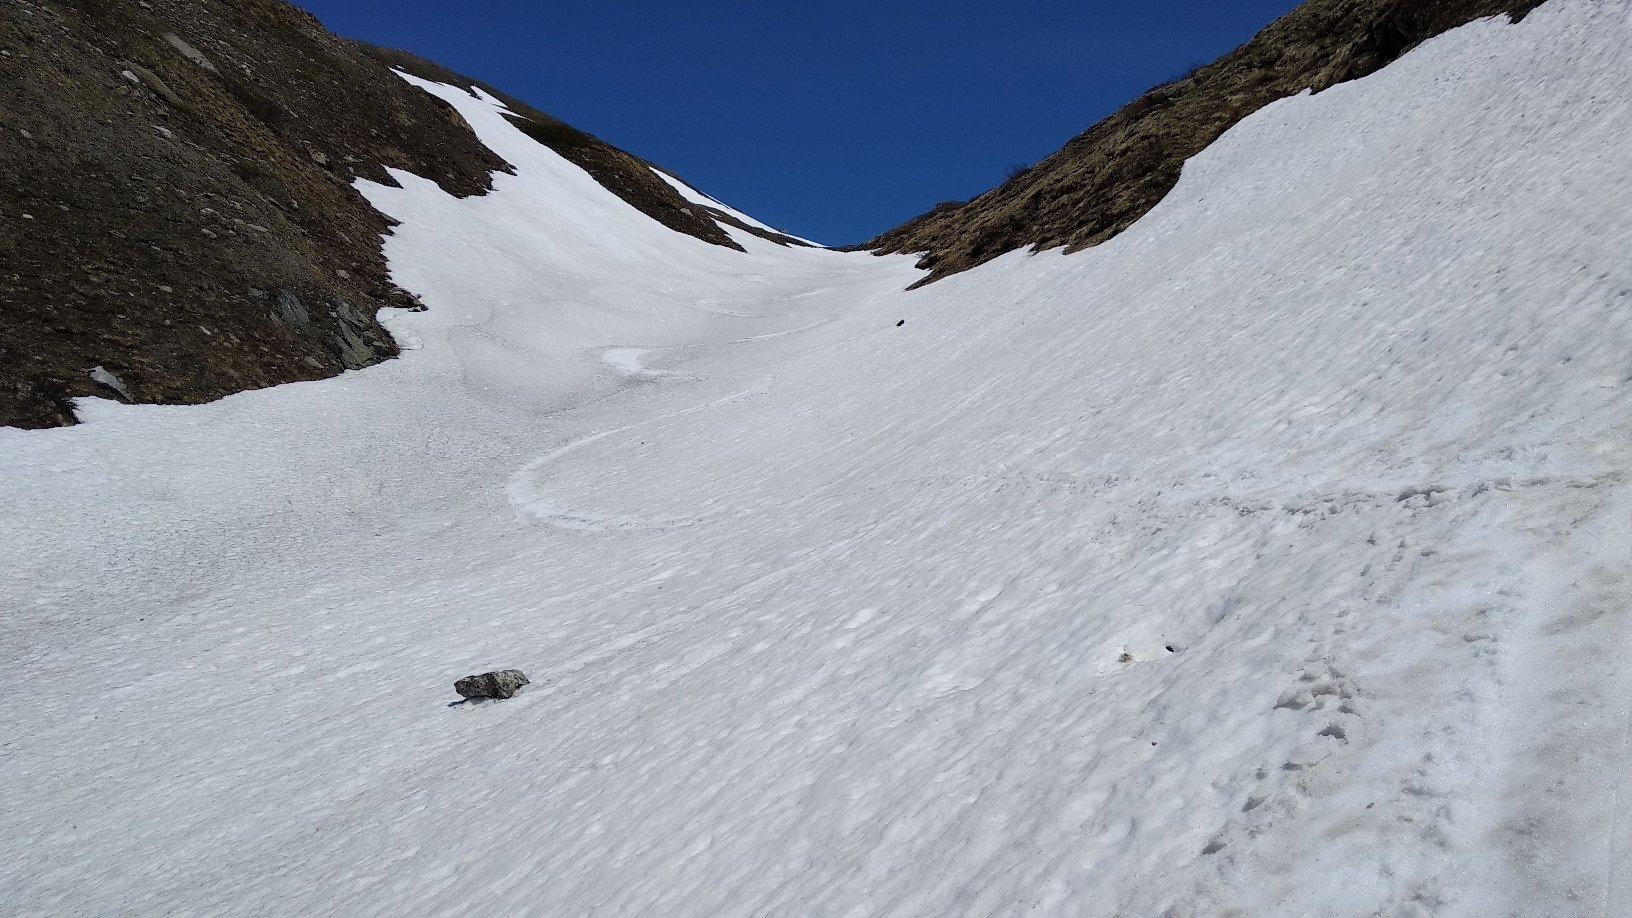 lingue di neve per l'ultimo tratto di discesa dal colle di St. Rhemy